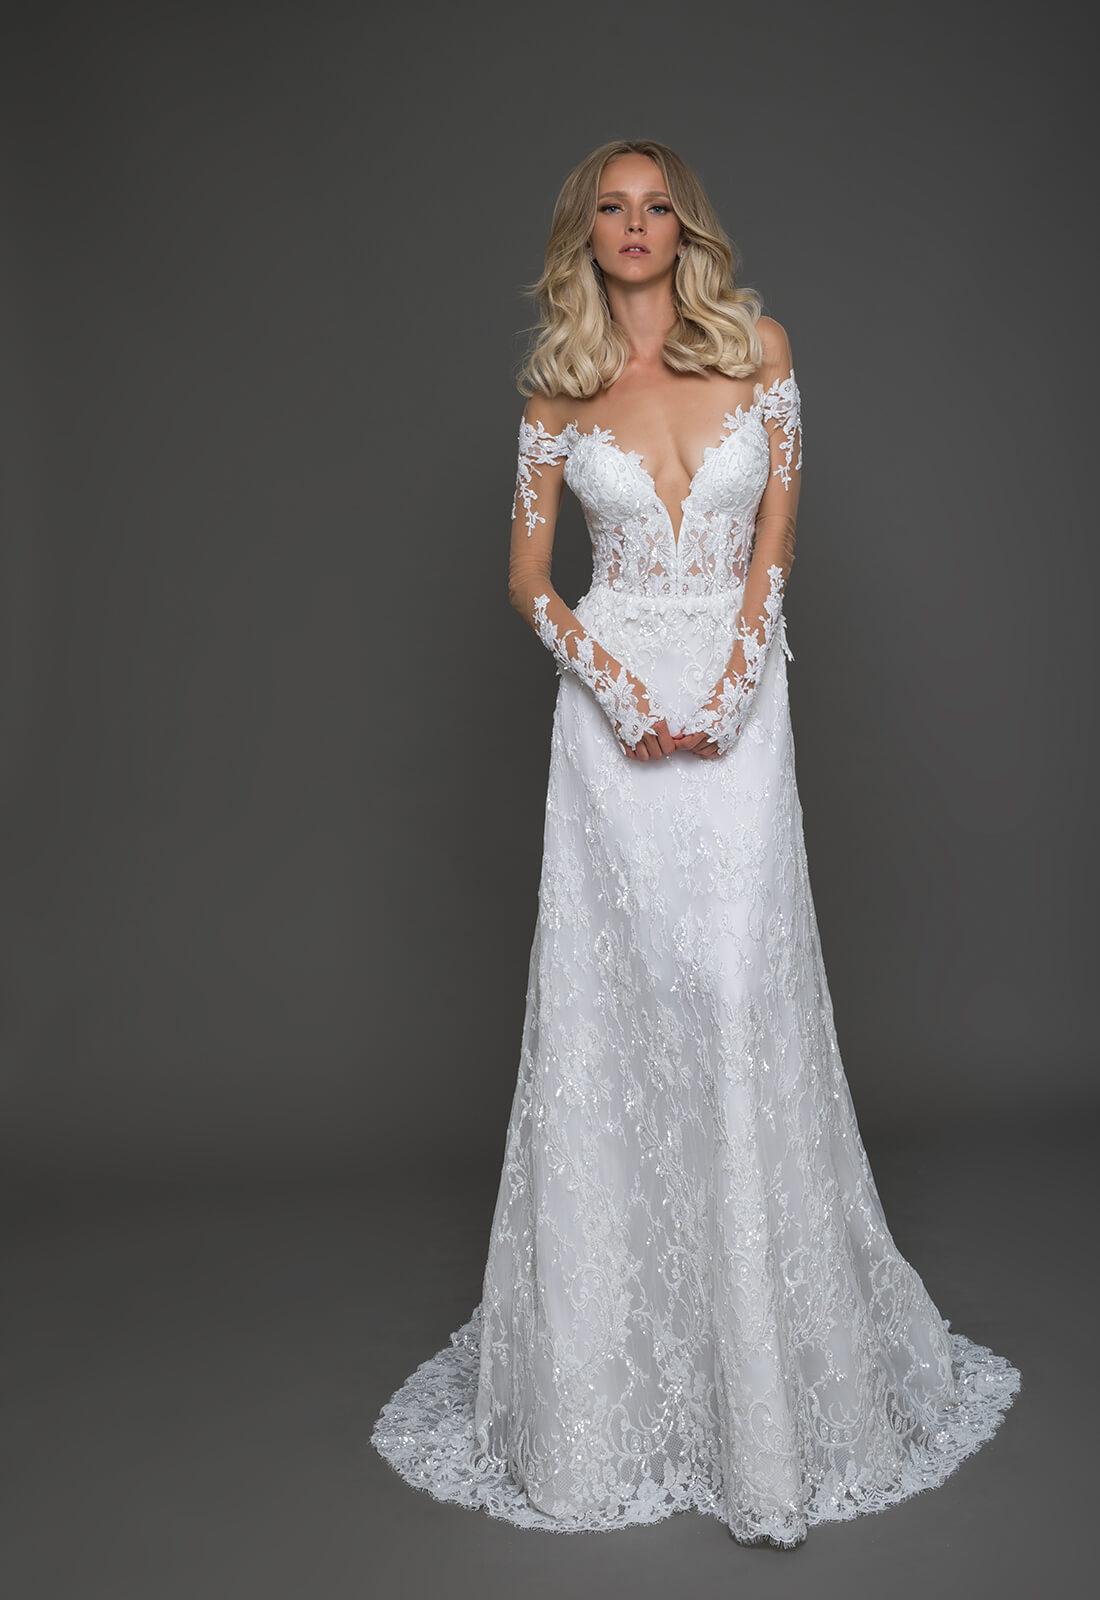 Pnina tornai for Chic and curvy wedding dress